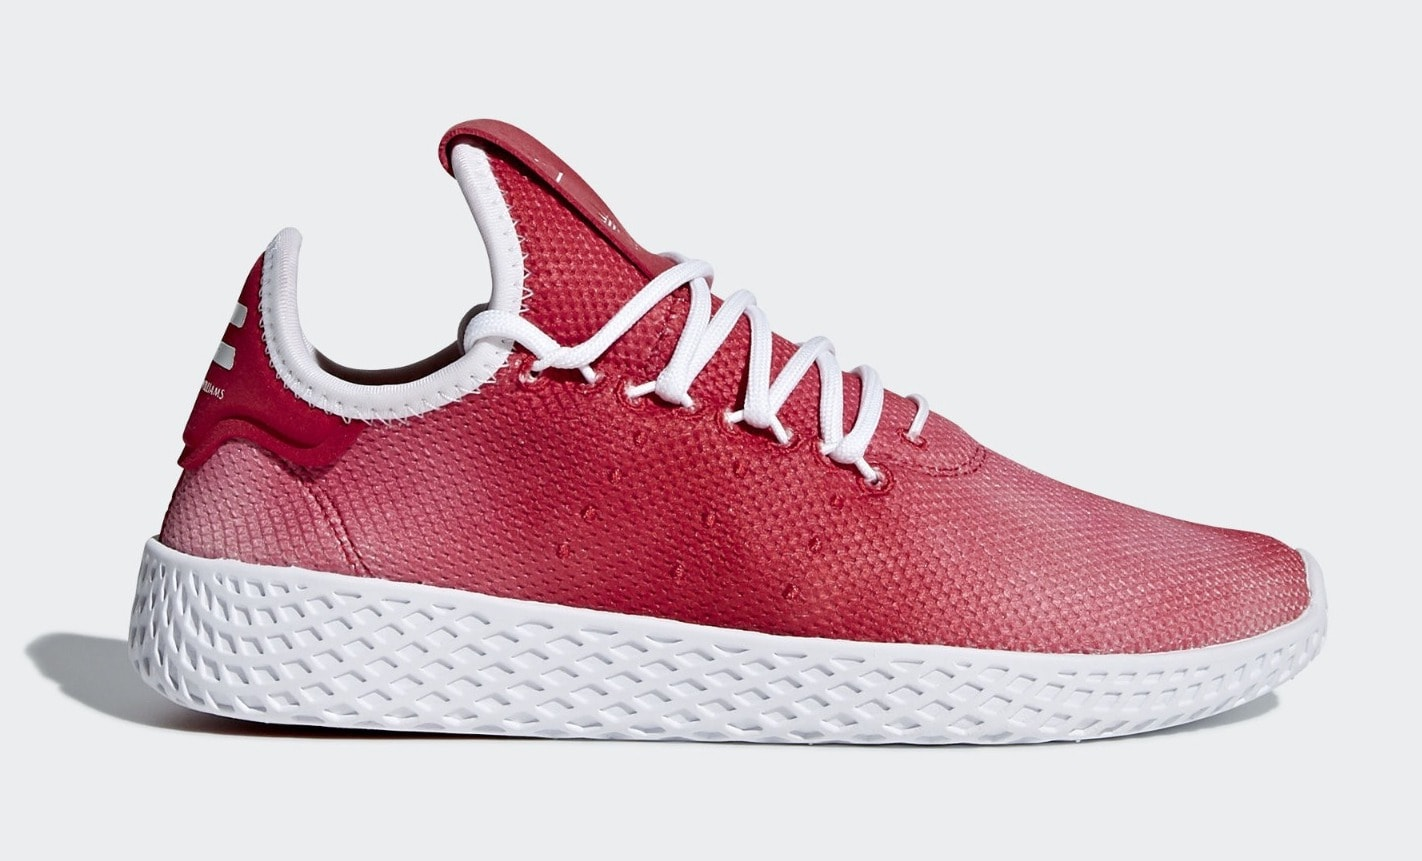 1c61b96fc7b Pharrell x adidas Tennis Hu